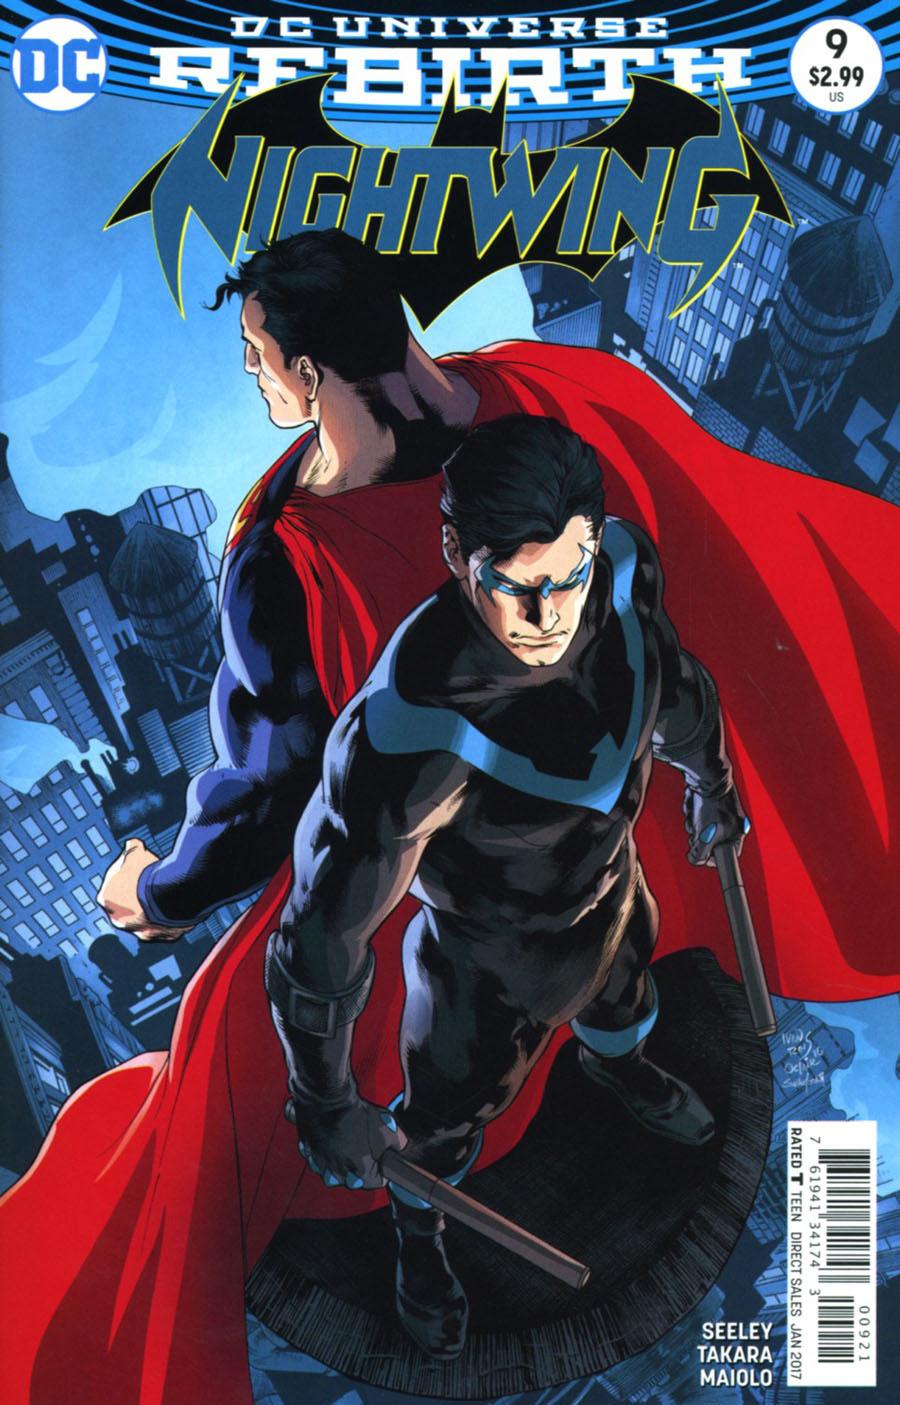 Nightwing Vol 4 #9 Cover B Variant Ivan Reis & Joe Prado Cover